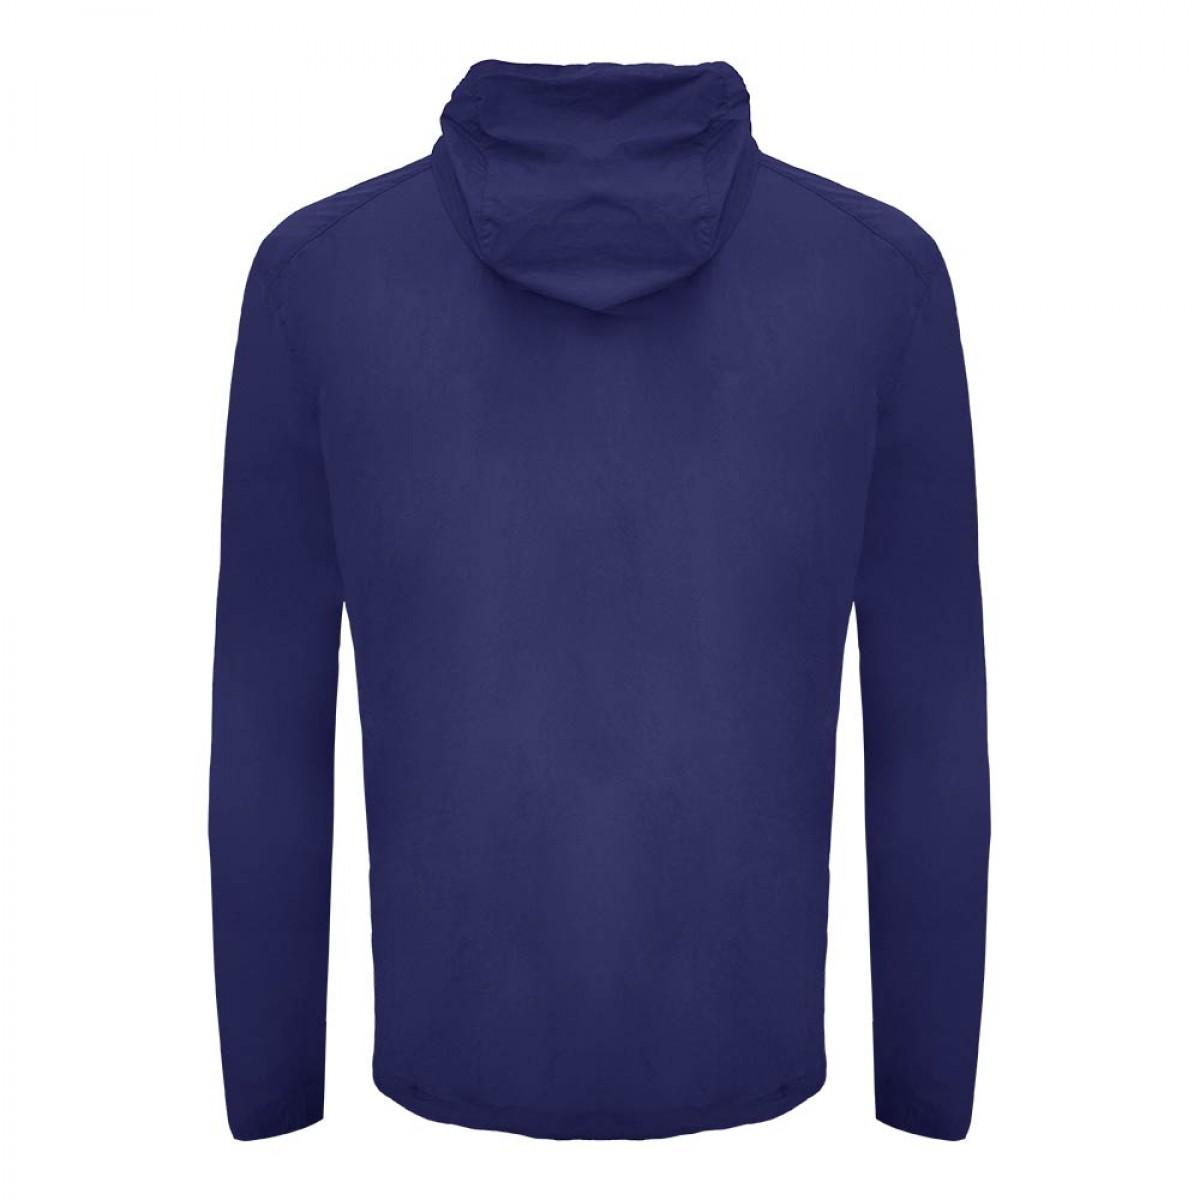 men-taffeta-windcheater-jacket-kmtwj15111-5a